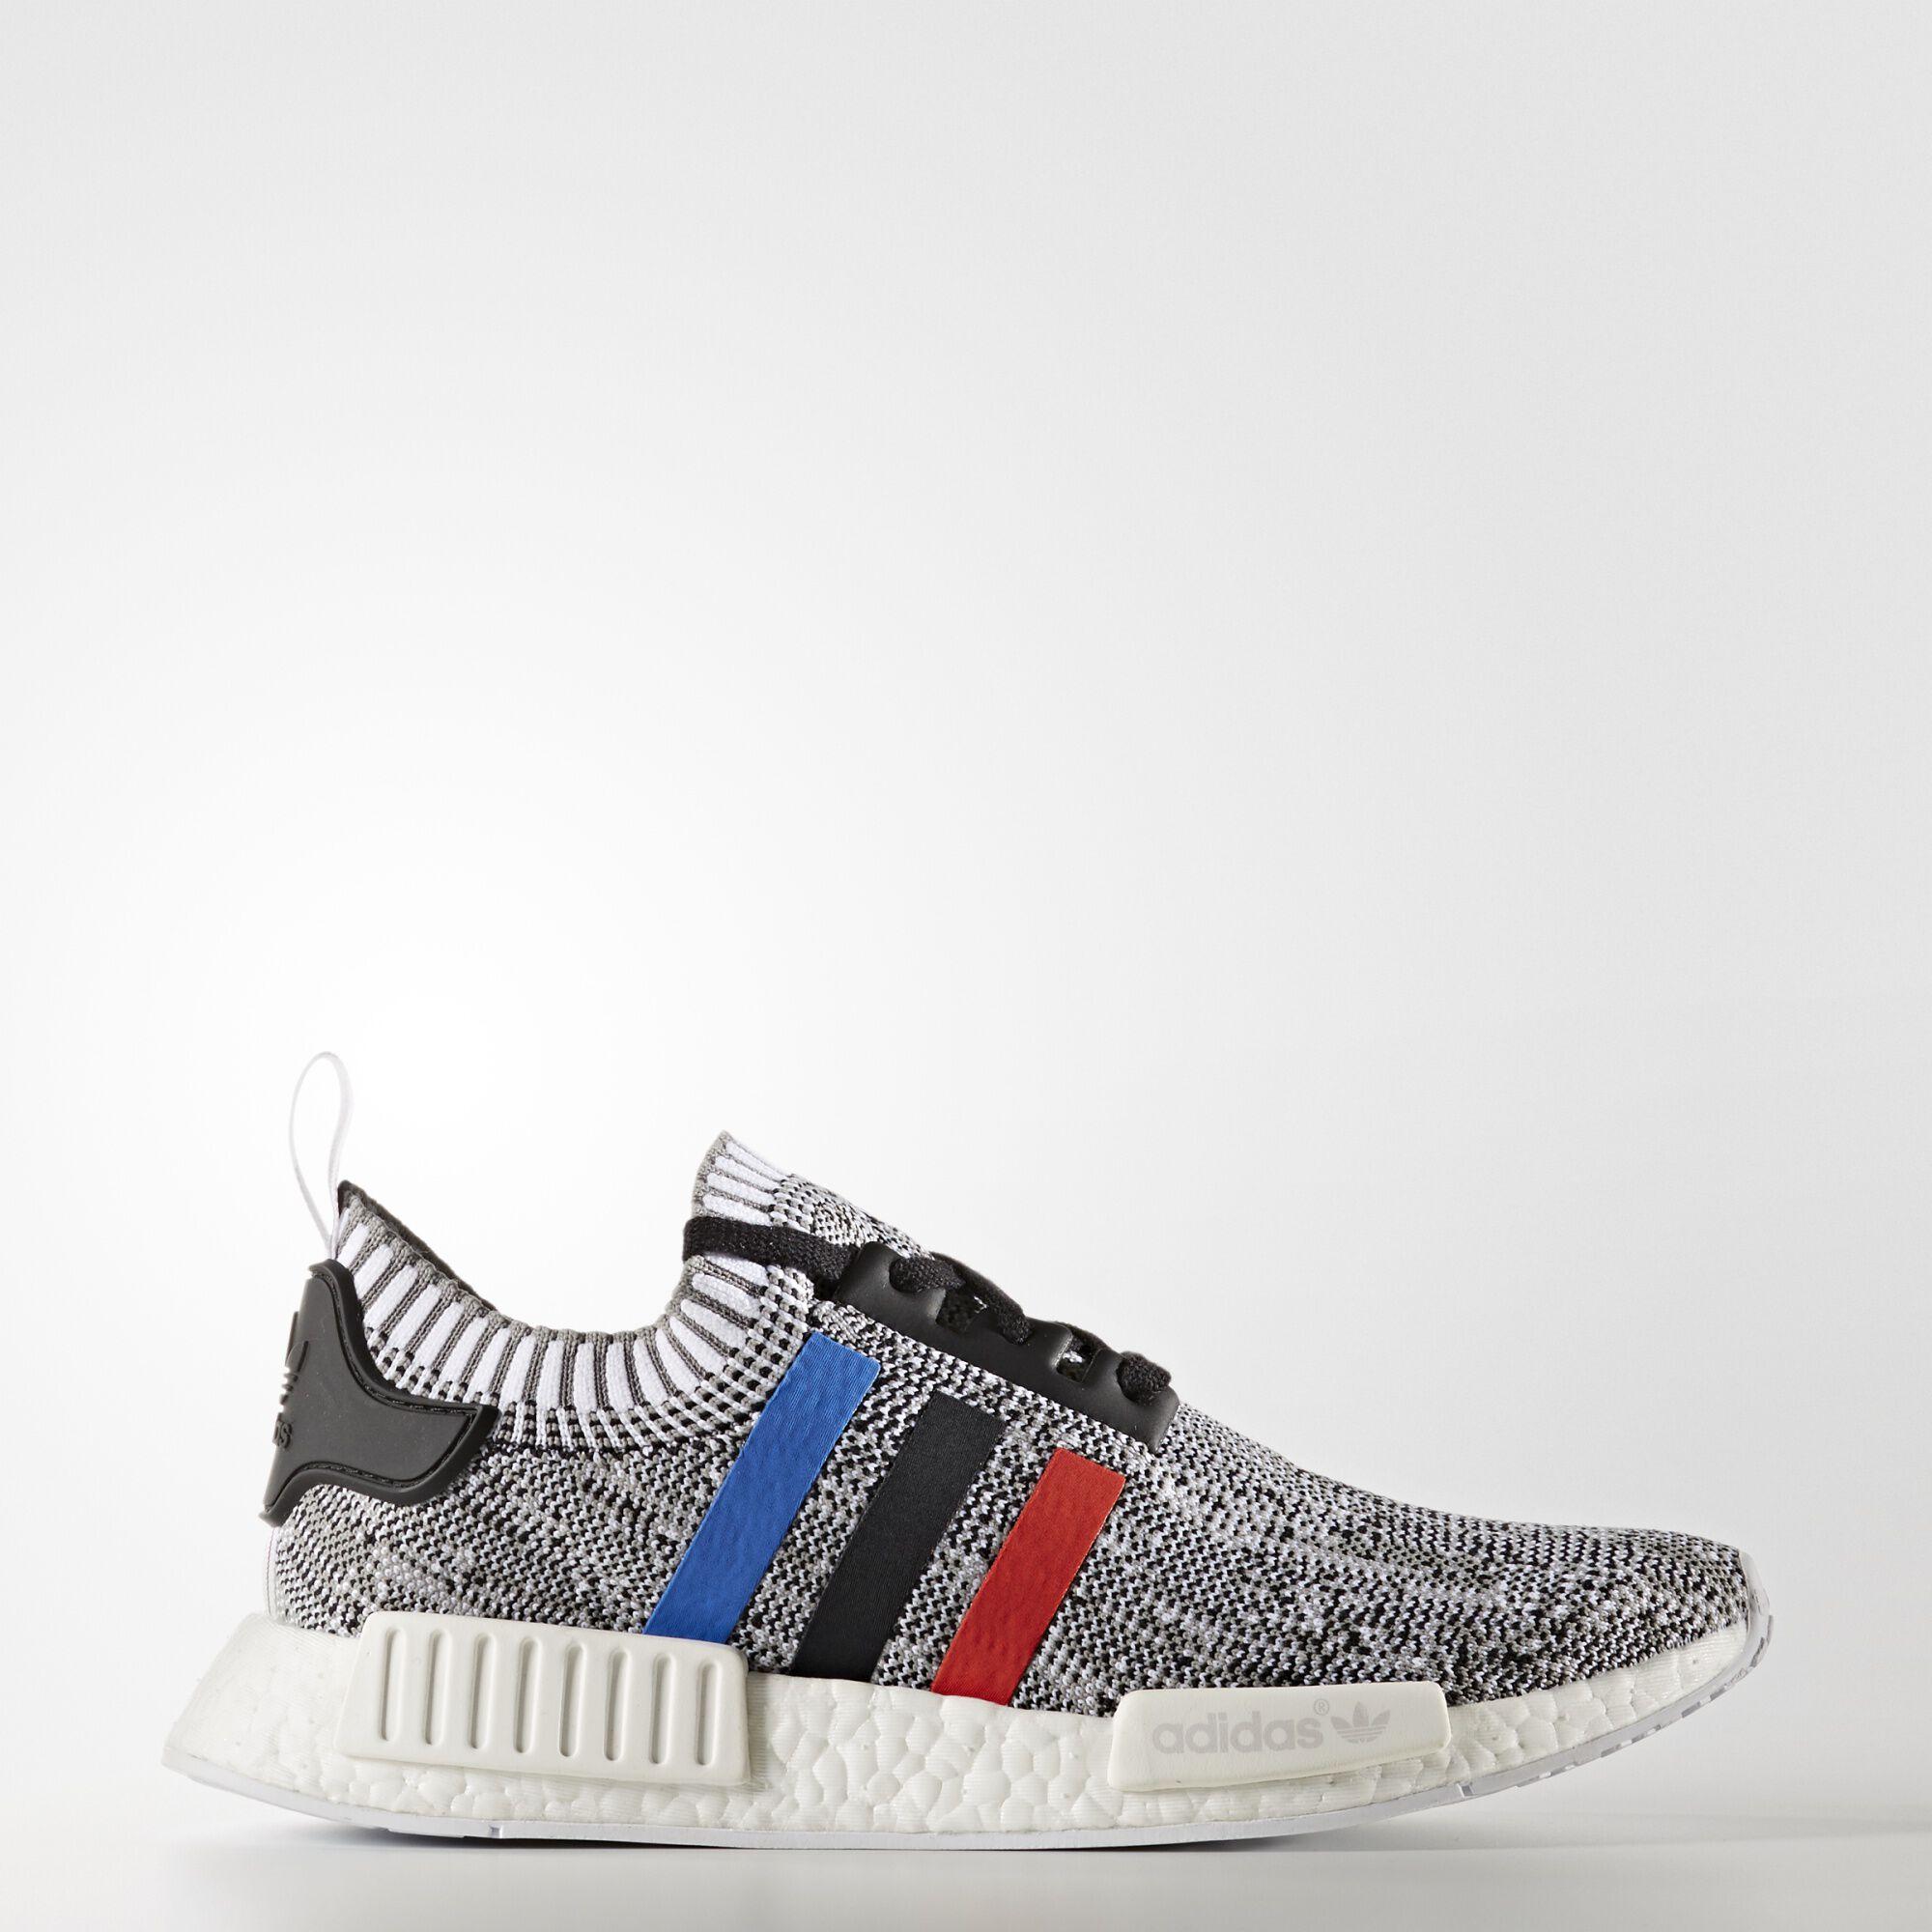 Primeknit Adidas Shoes